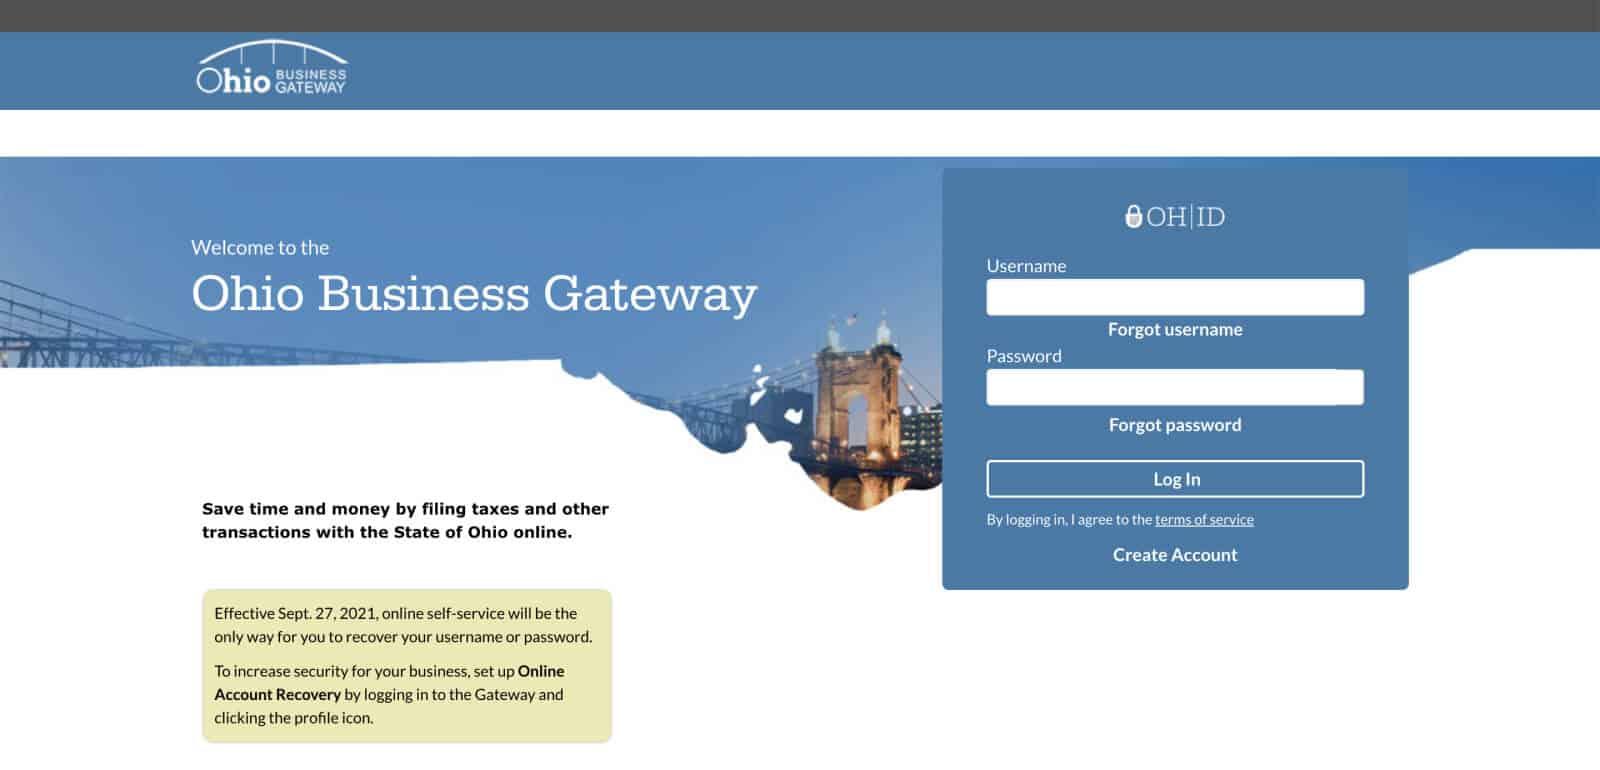 Ohio Business Gateway landing page